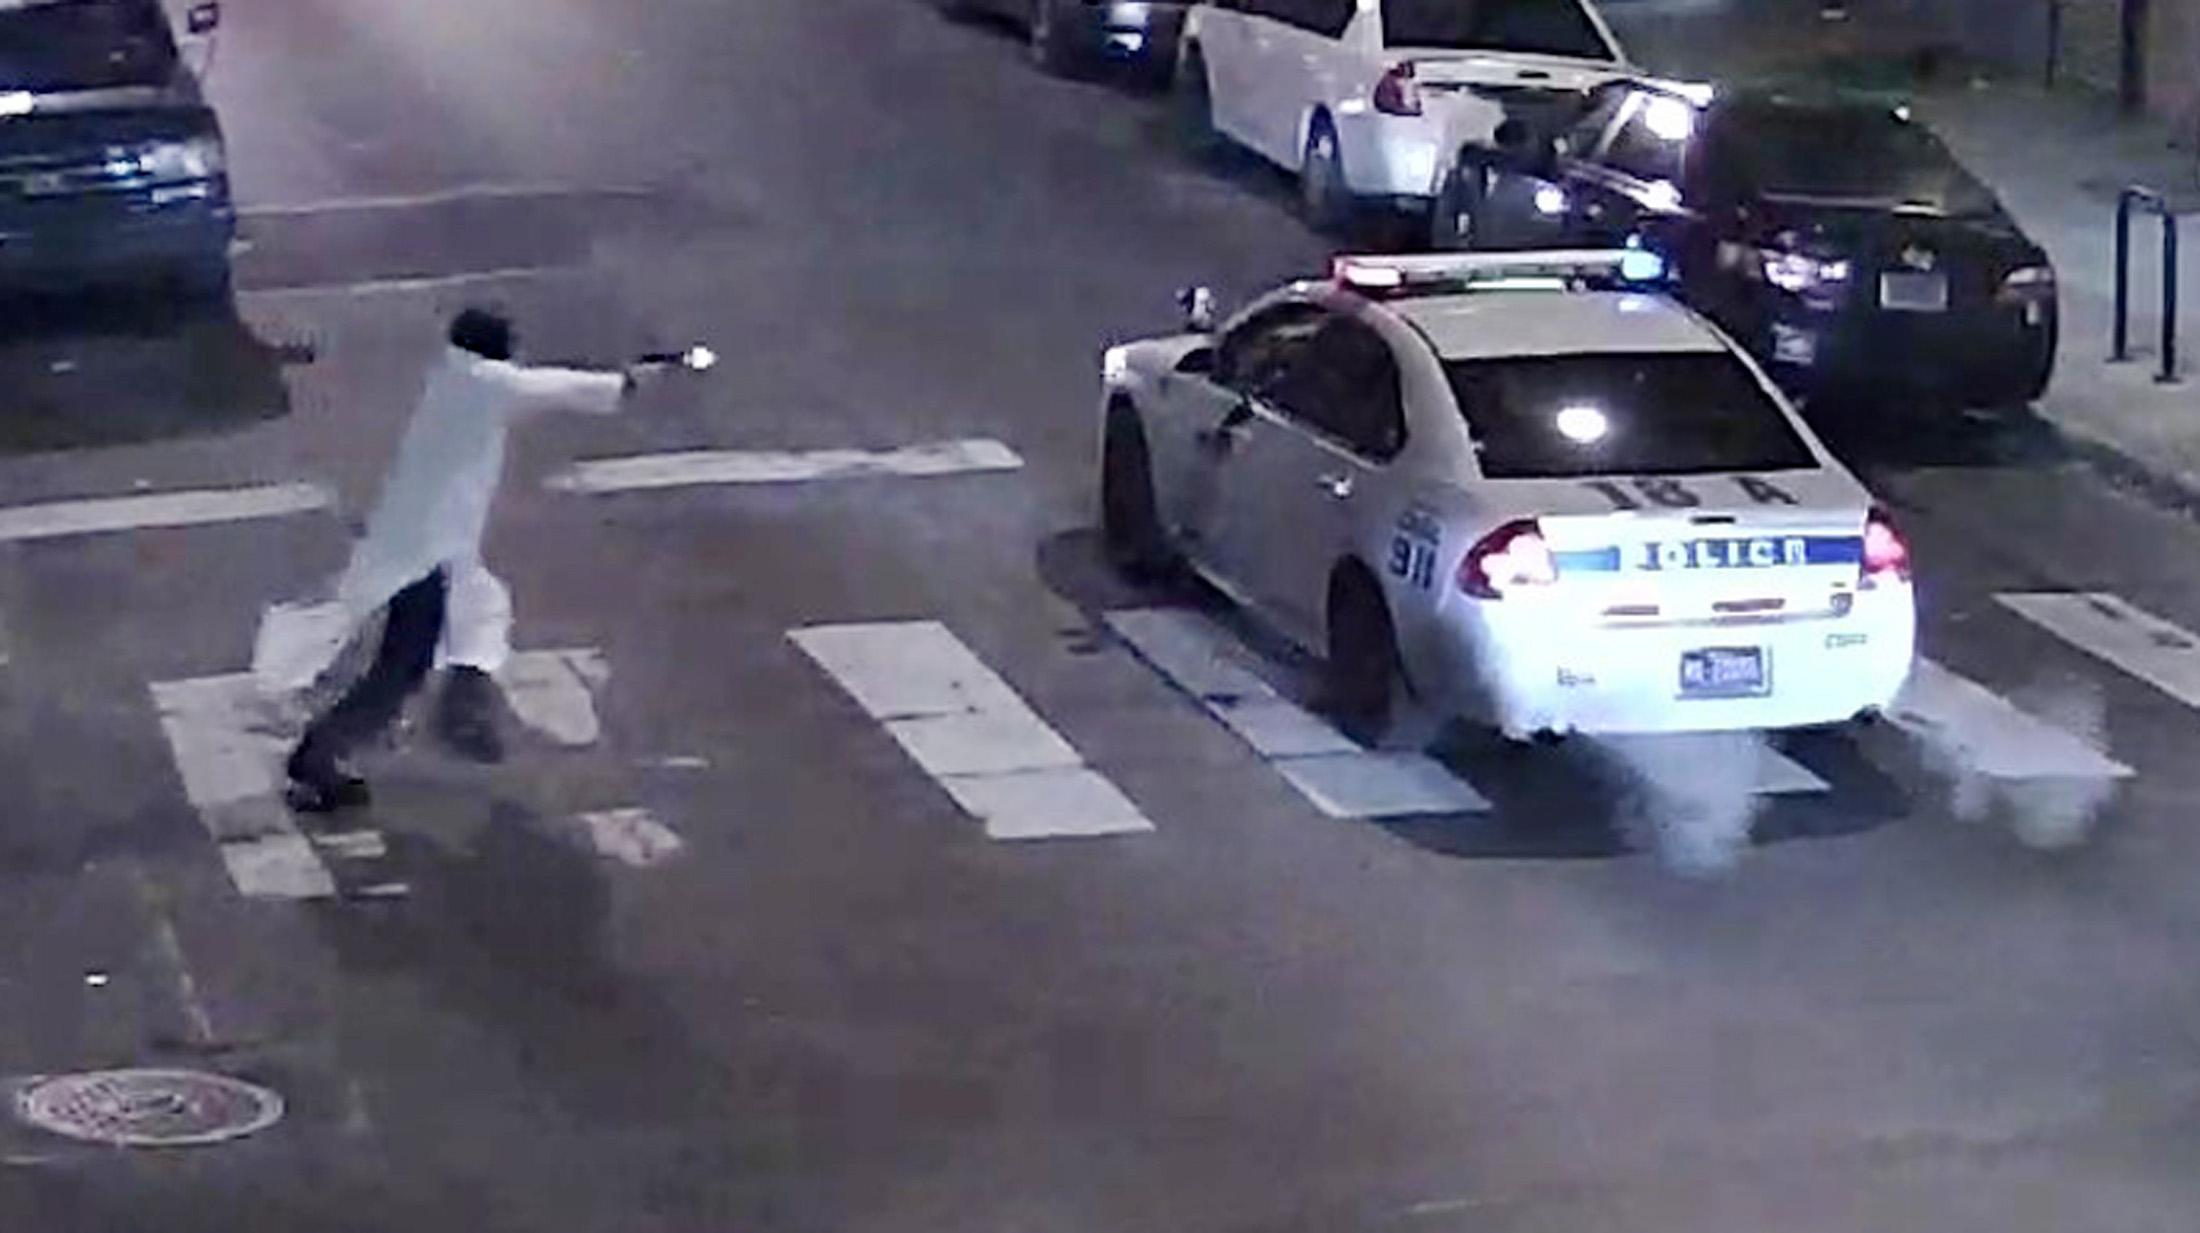 FBI investigating Philadelphia cop shooting as terrorism